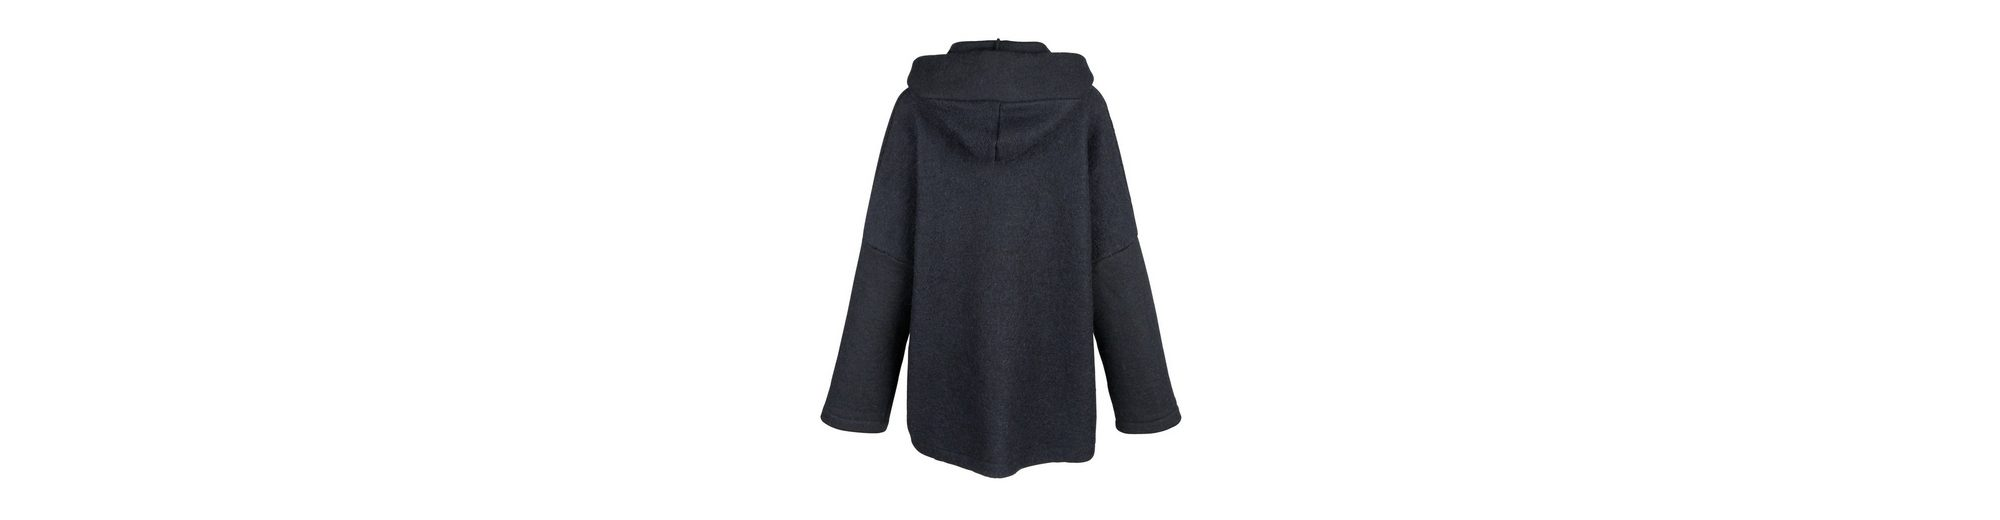 Alba Moda Oversized-Jacke mit Kapuze Günstiger Preis Vorbestellung xZLKxVGk8E